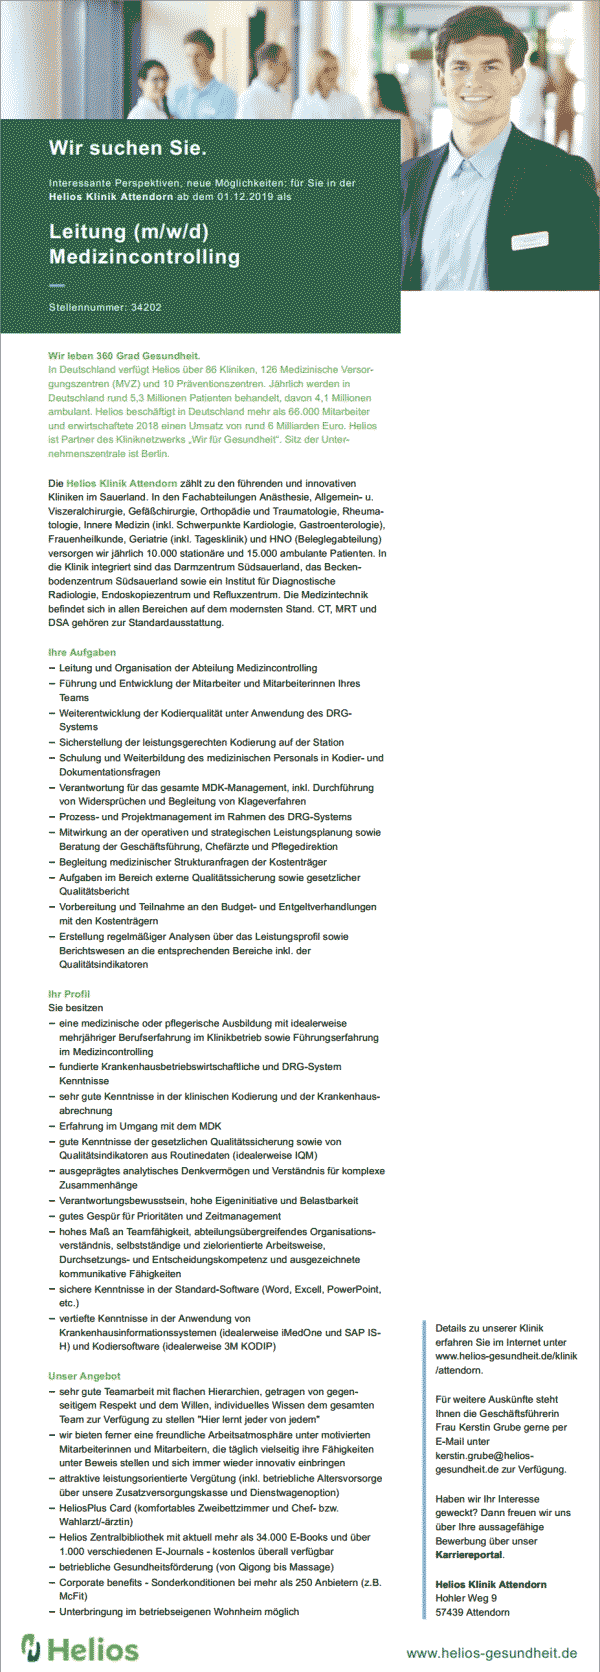 Helios Klinik Attendorn: Leitung Medizincontrolling (m/w/d)